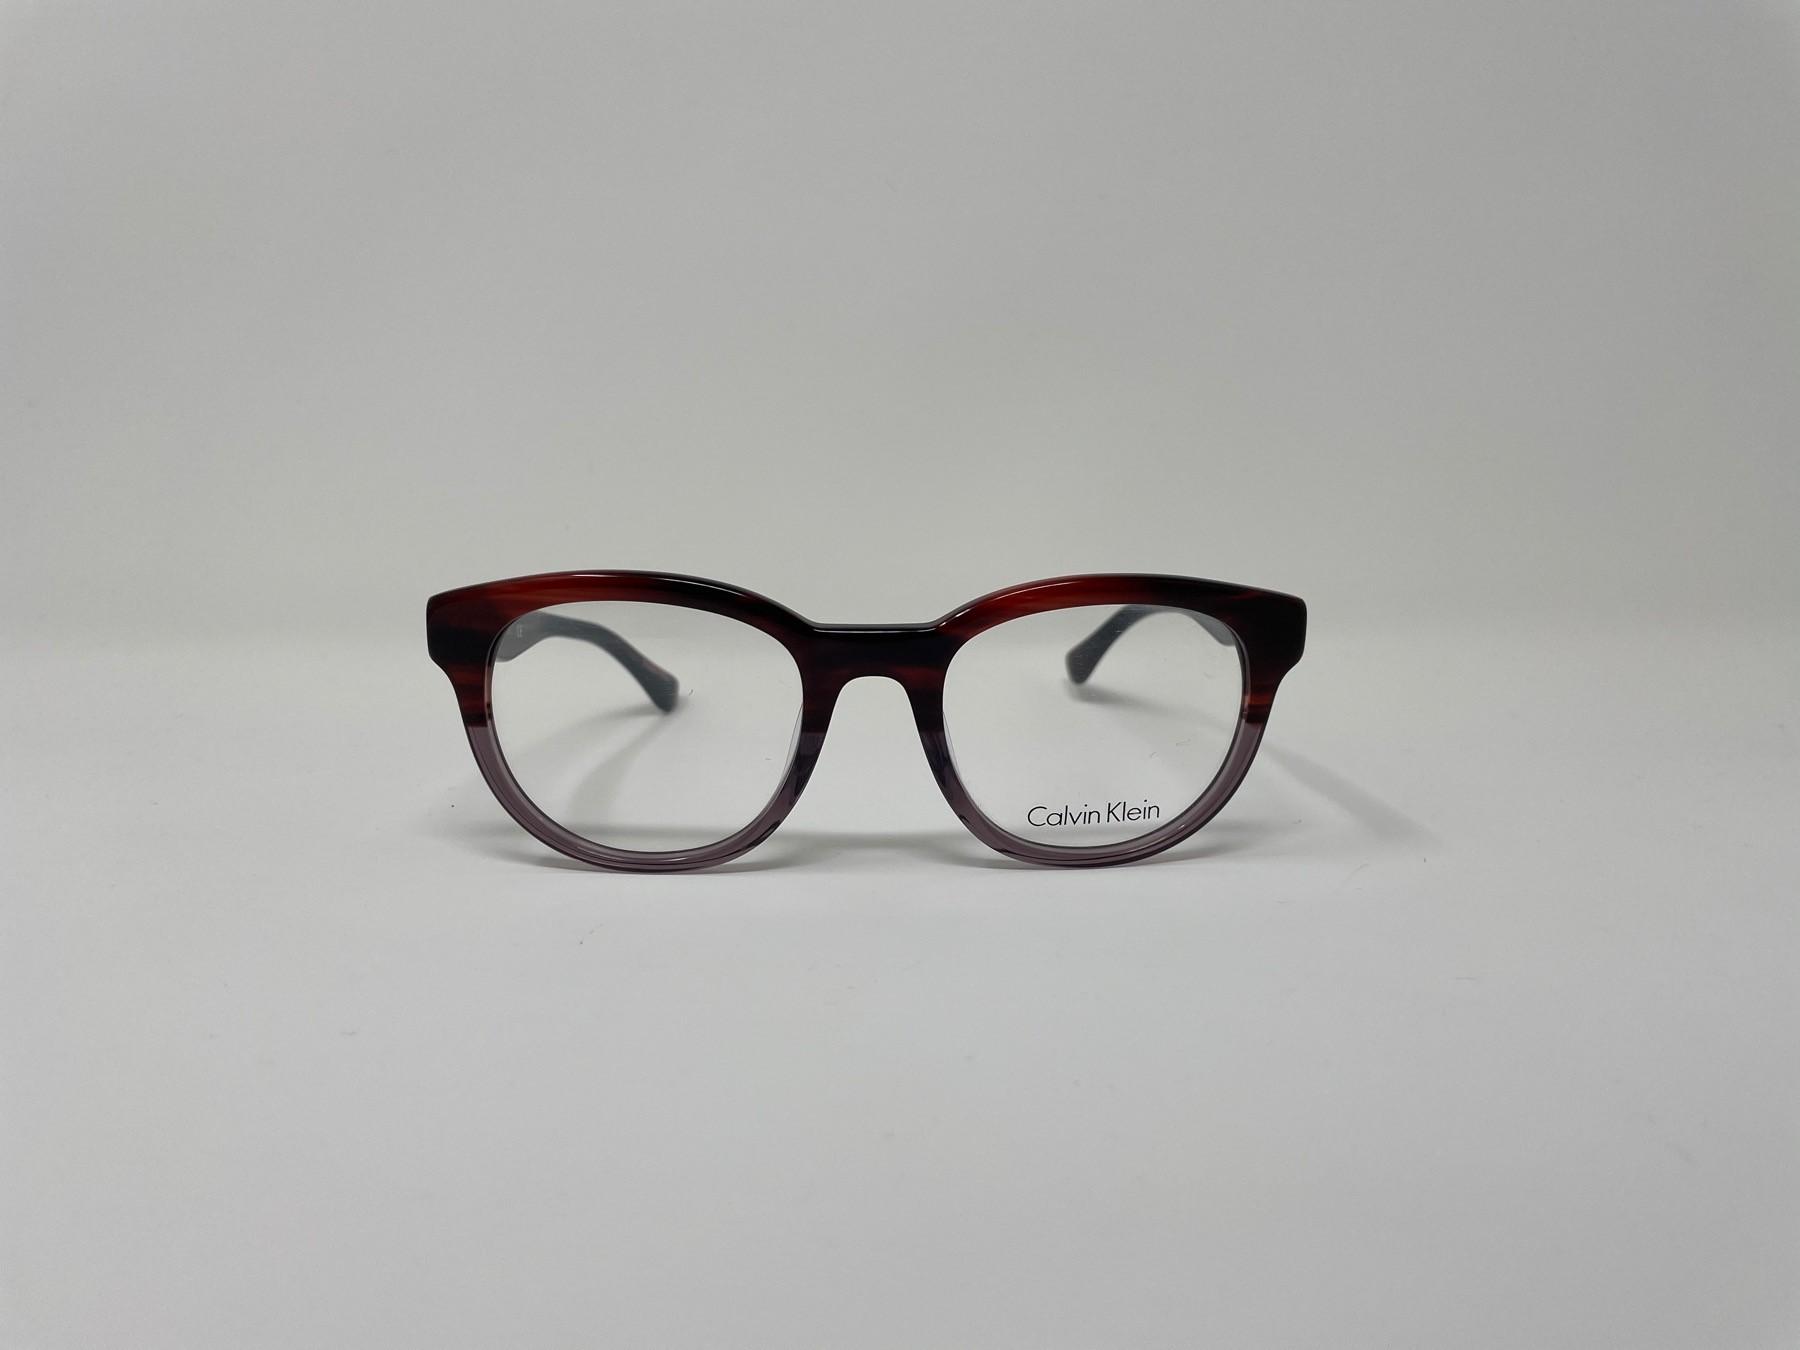 Calvin Klein CK 5887 Unisex eyeglasses